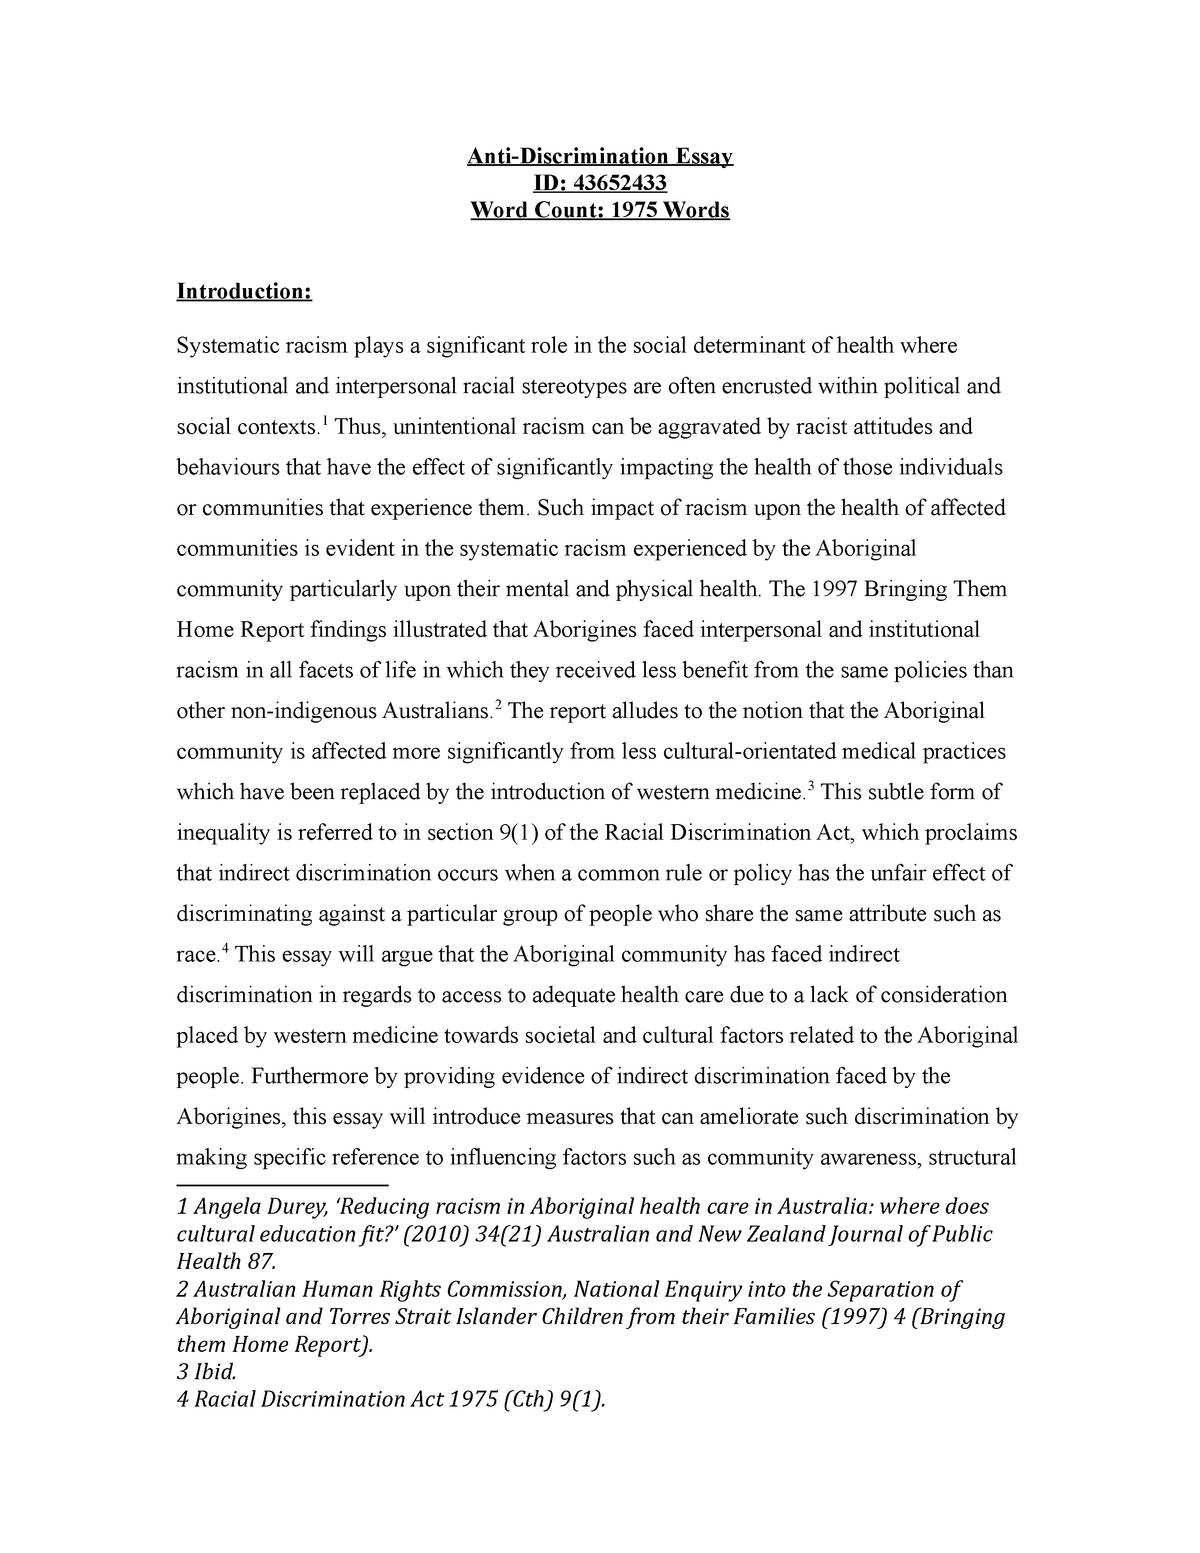 Inequalities detrimental health essay